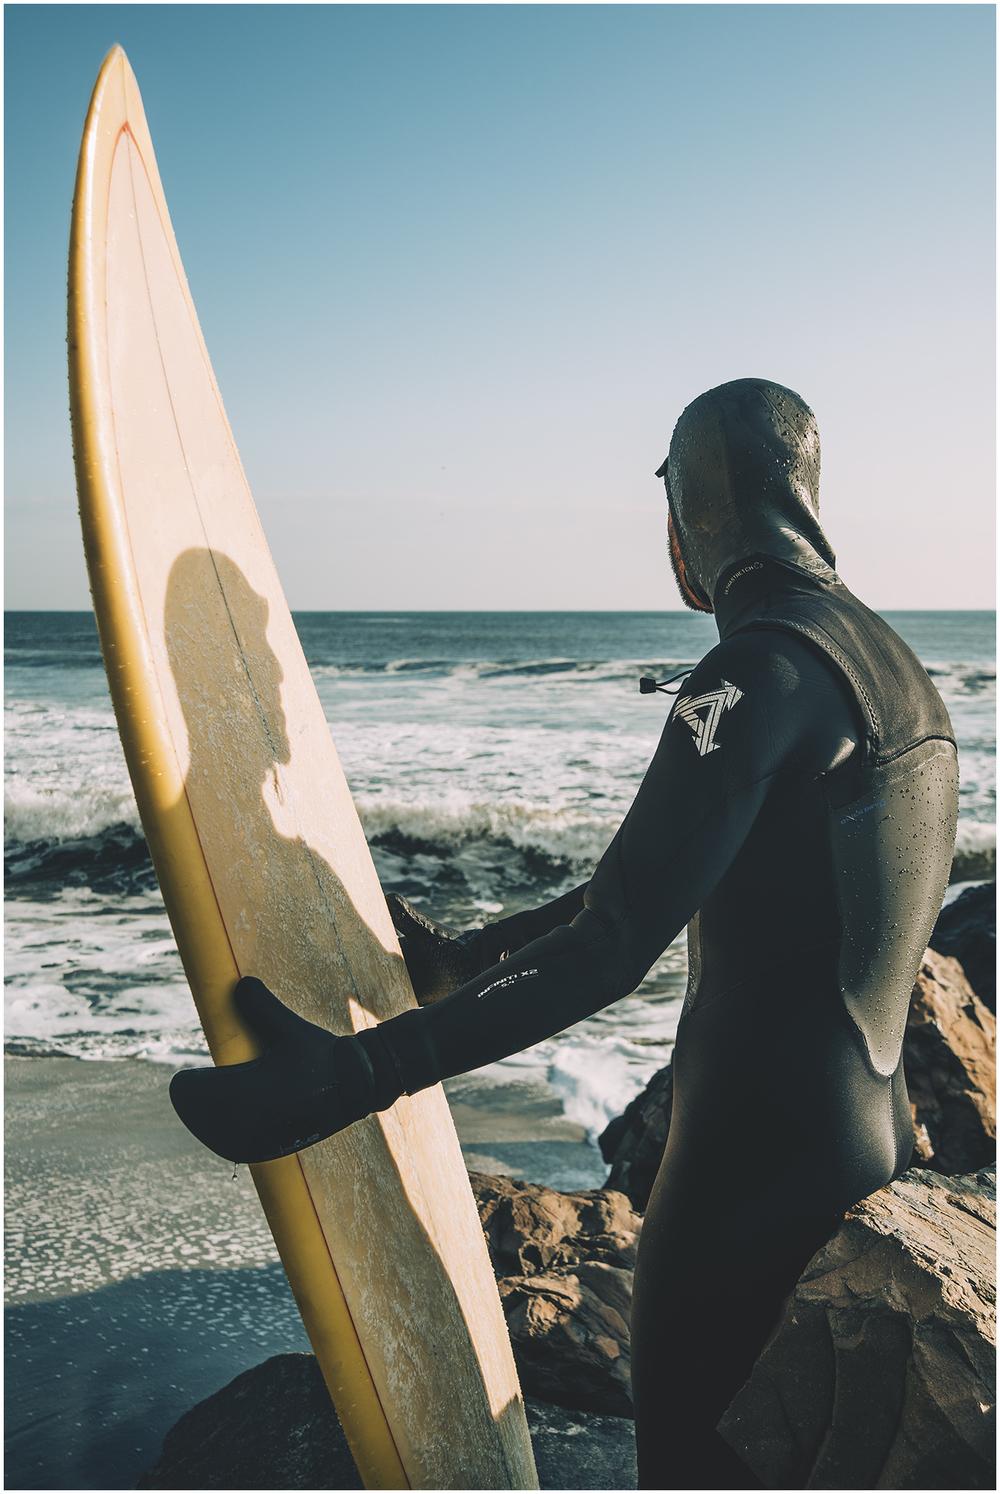 012515_wintersurf_yellowboard_WEB.jpg